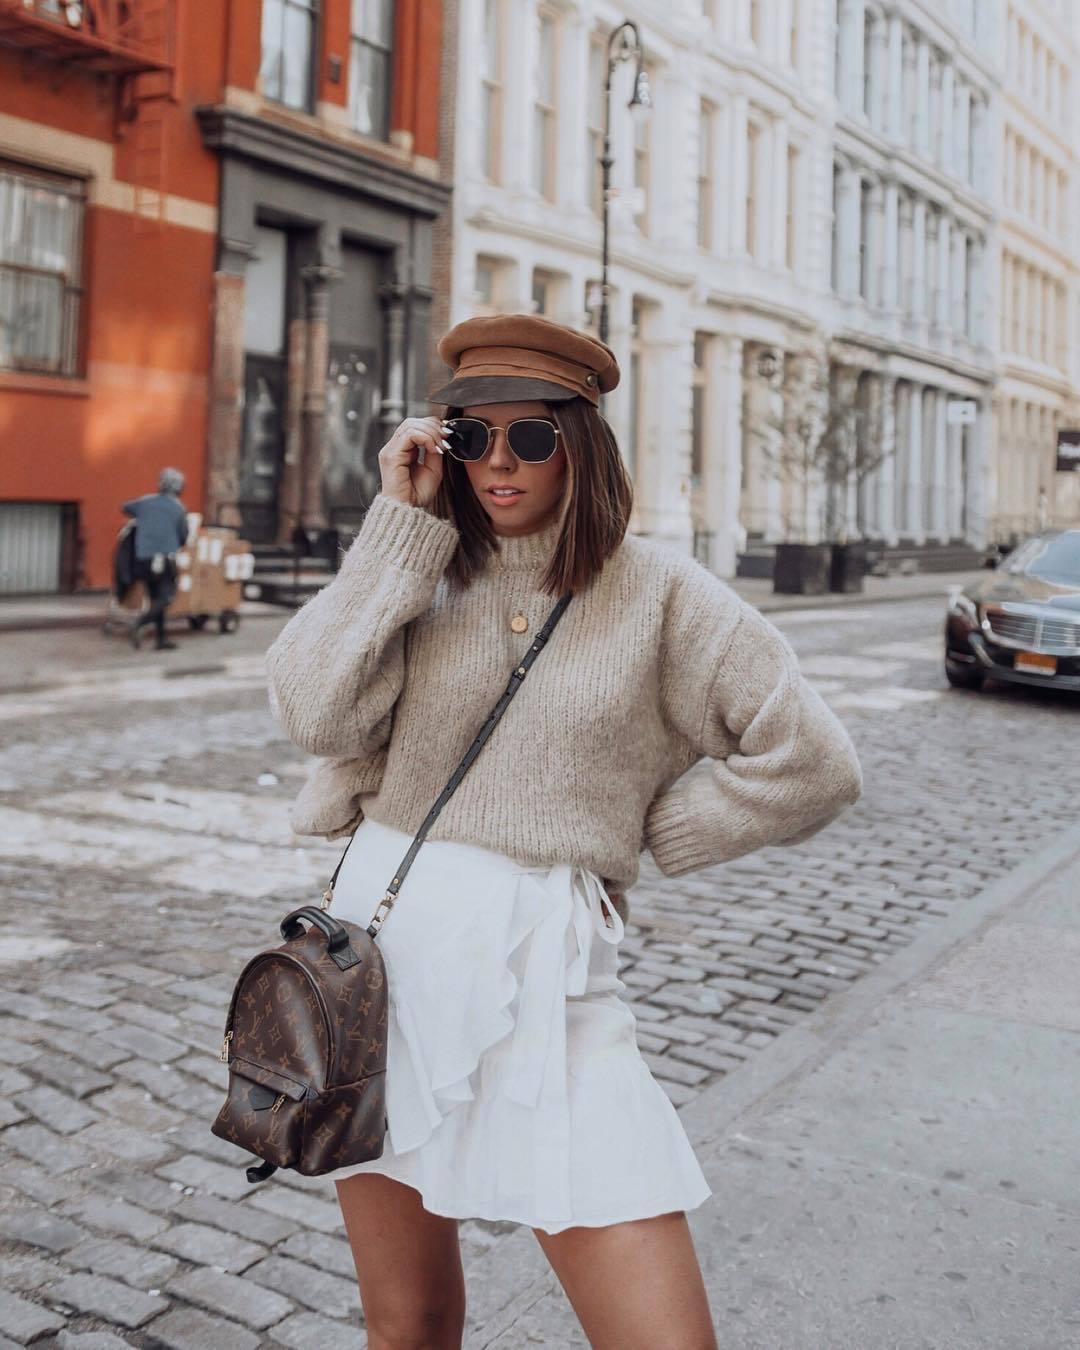 sweater knitted sweater oversized sweater white skirt mini skirt wrap skirt louis vuitton bag beret sunglasses